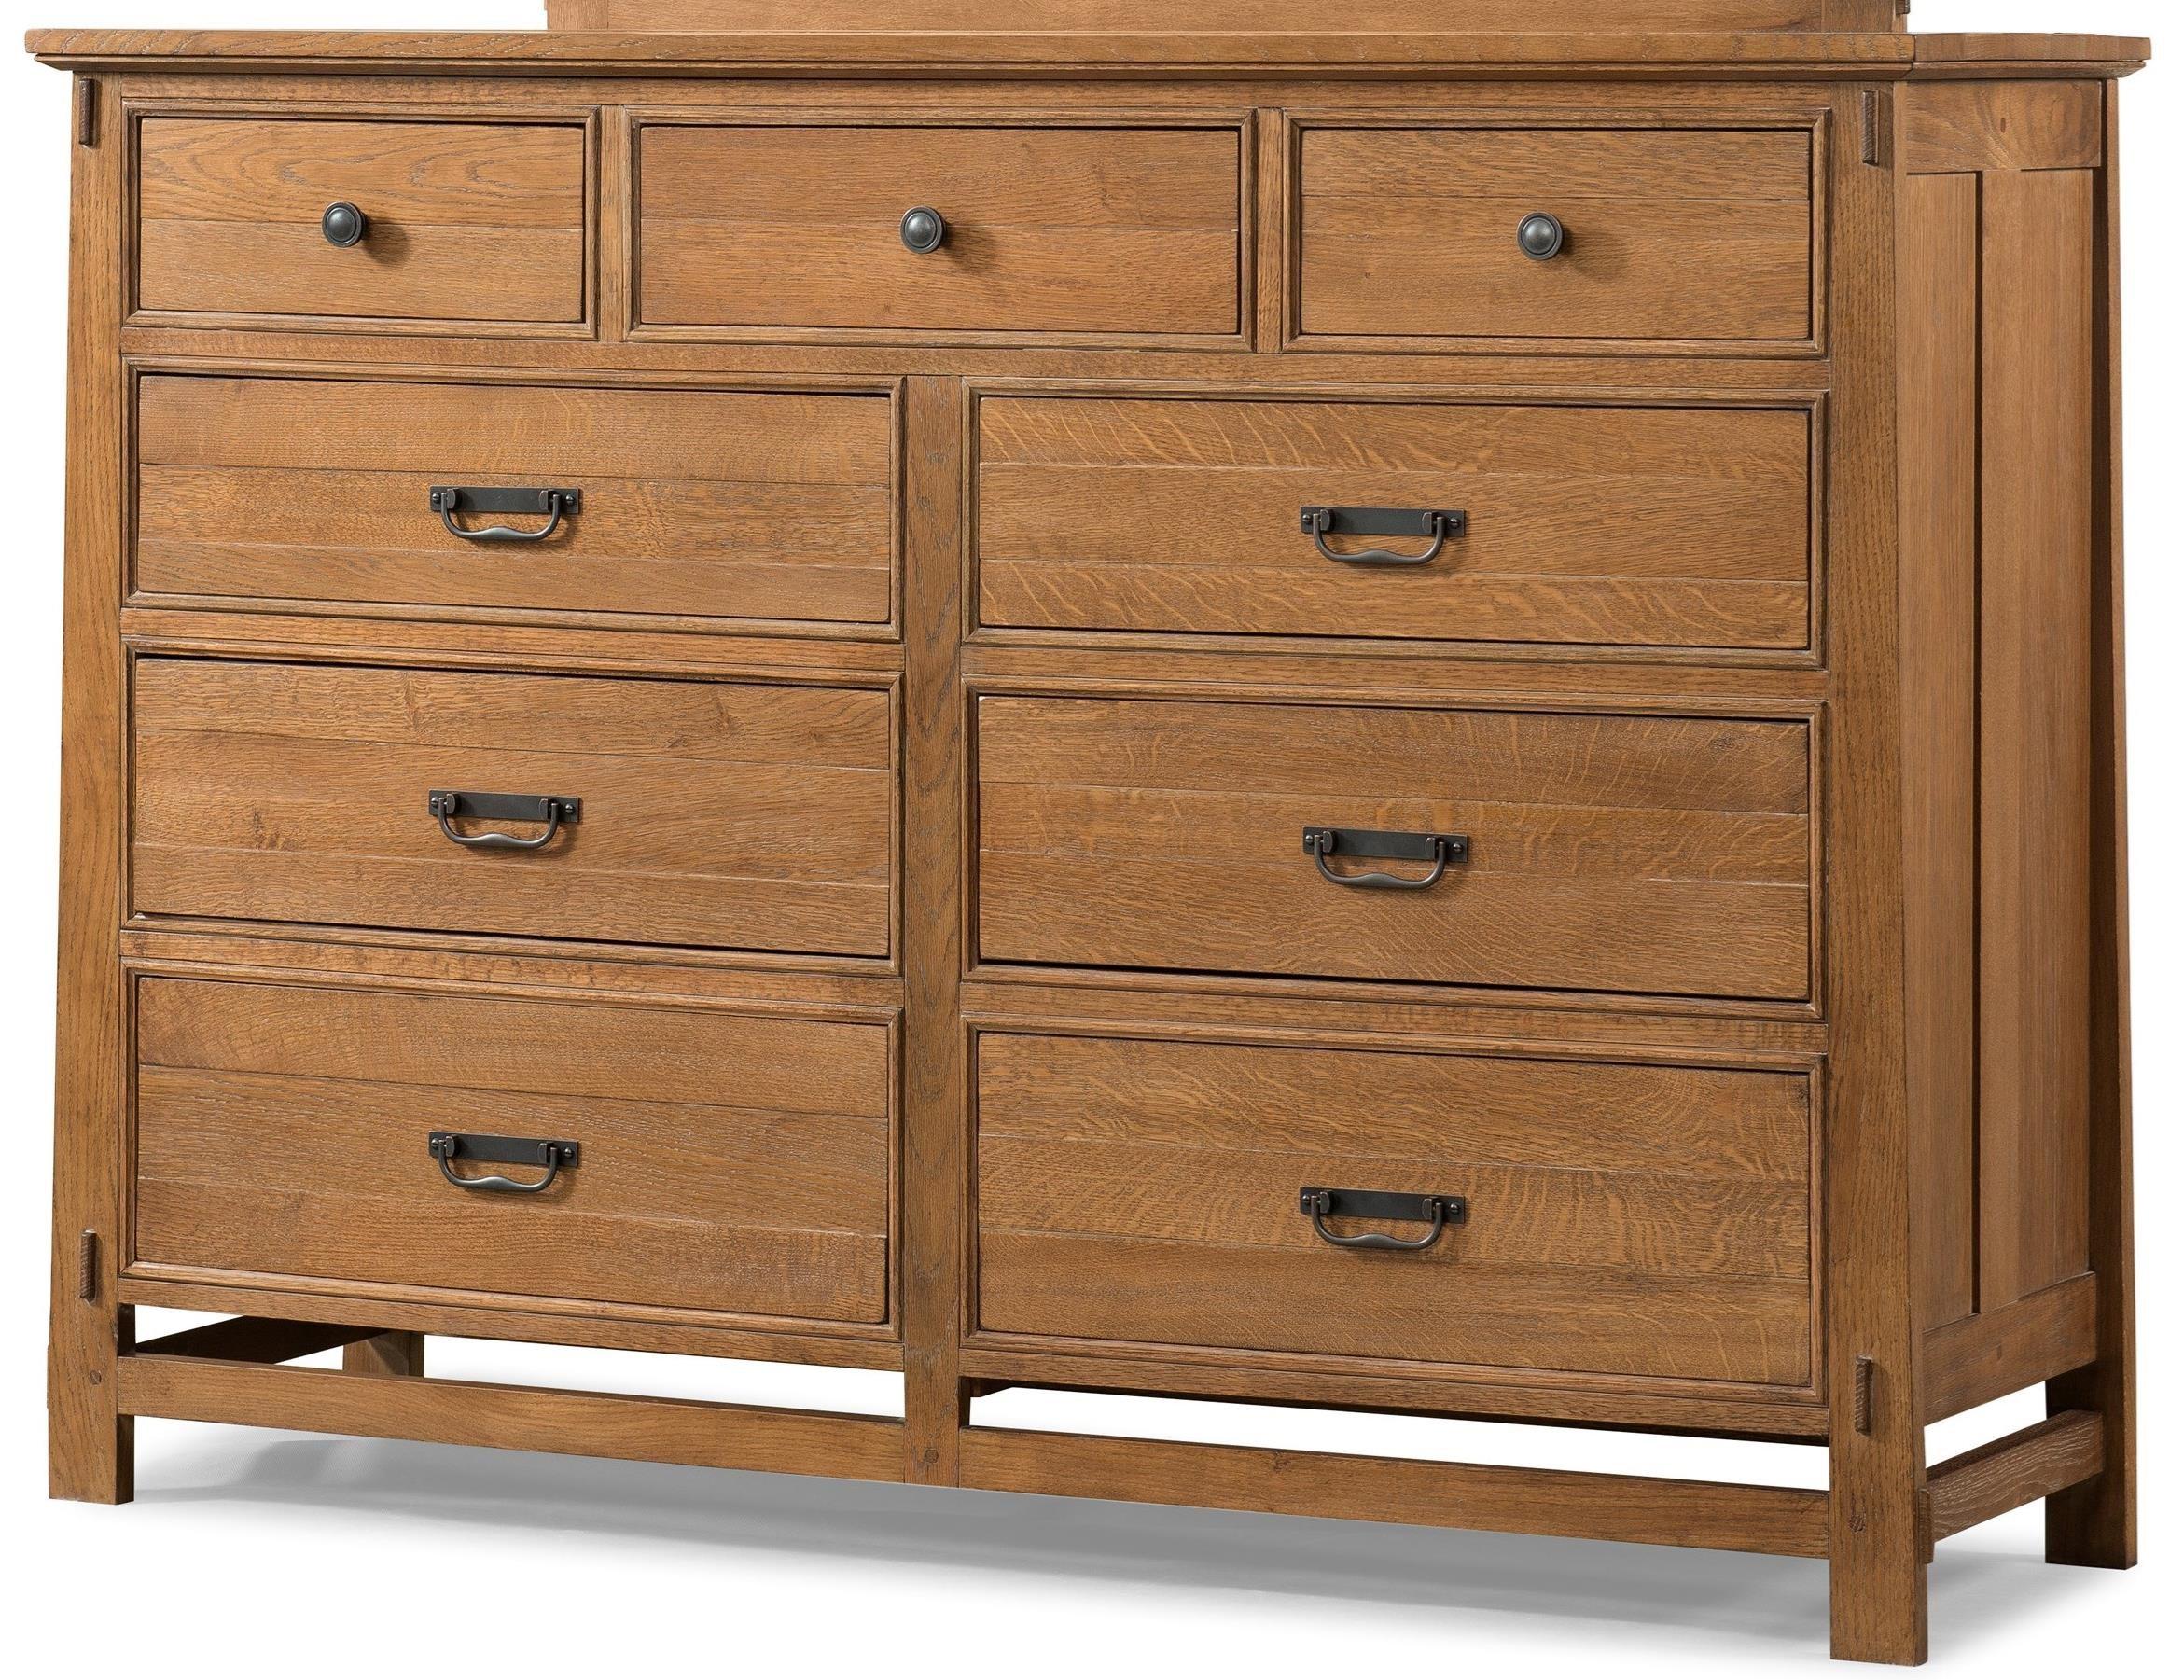 Cresent fine furniture camden 202 101 9 drawer media for Furniture 101